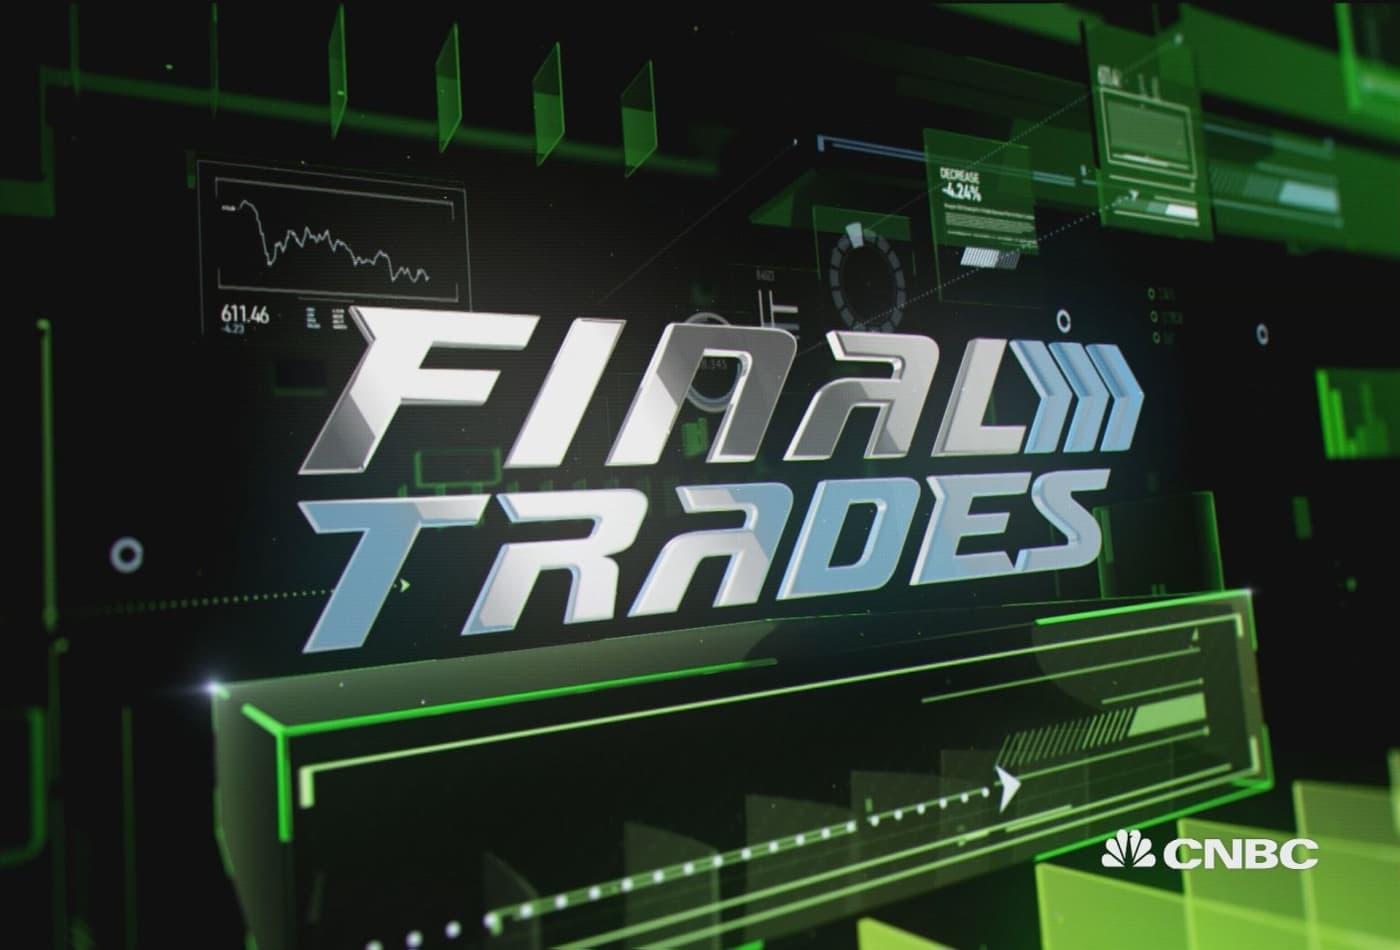 Final Trades: Keysight Technologies, UnitedHealth, Lockheed Martin & more